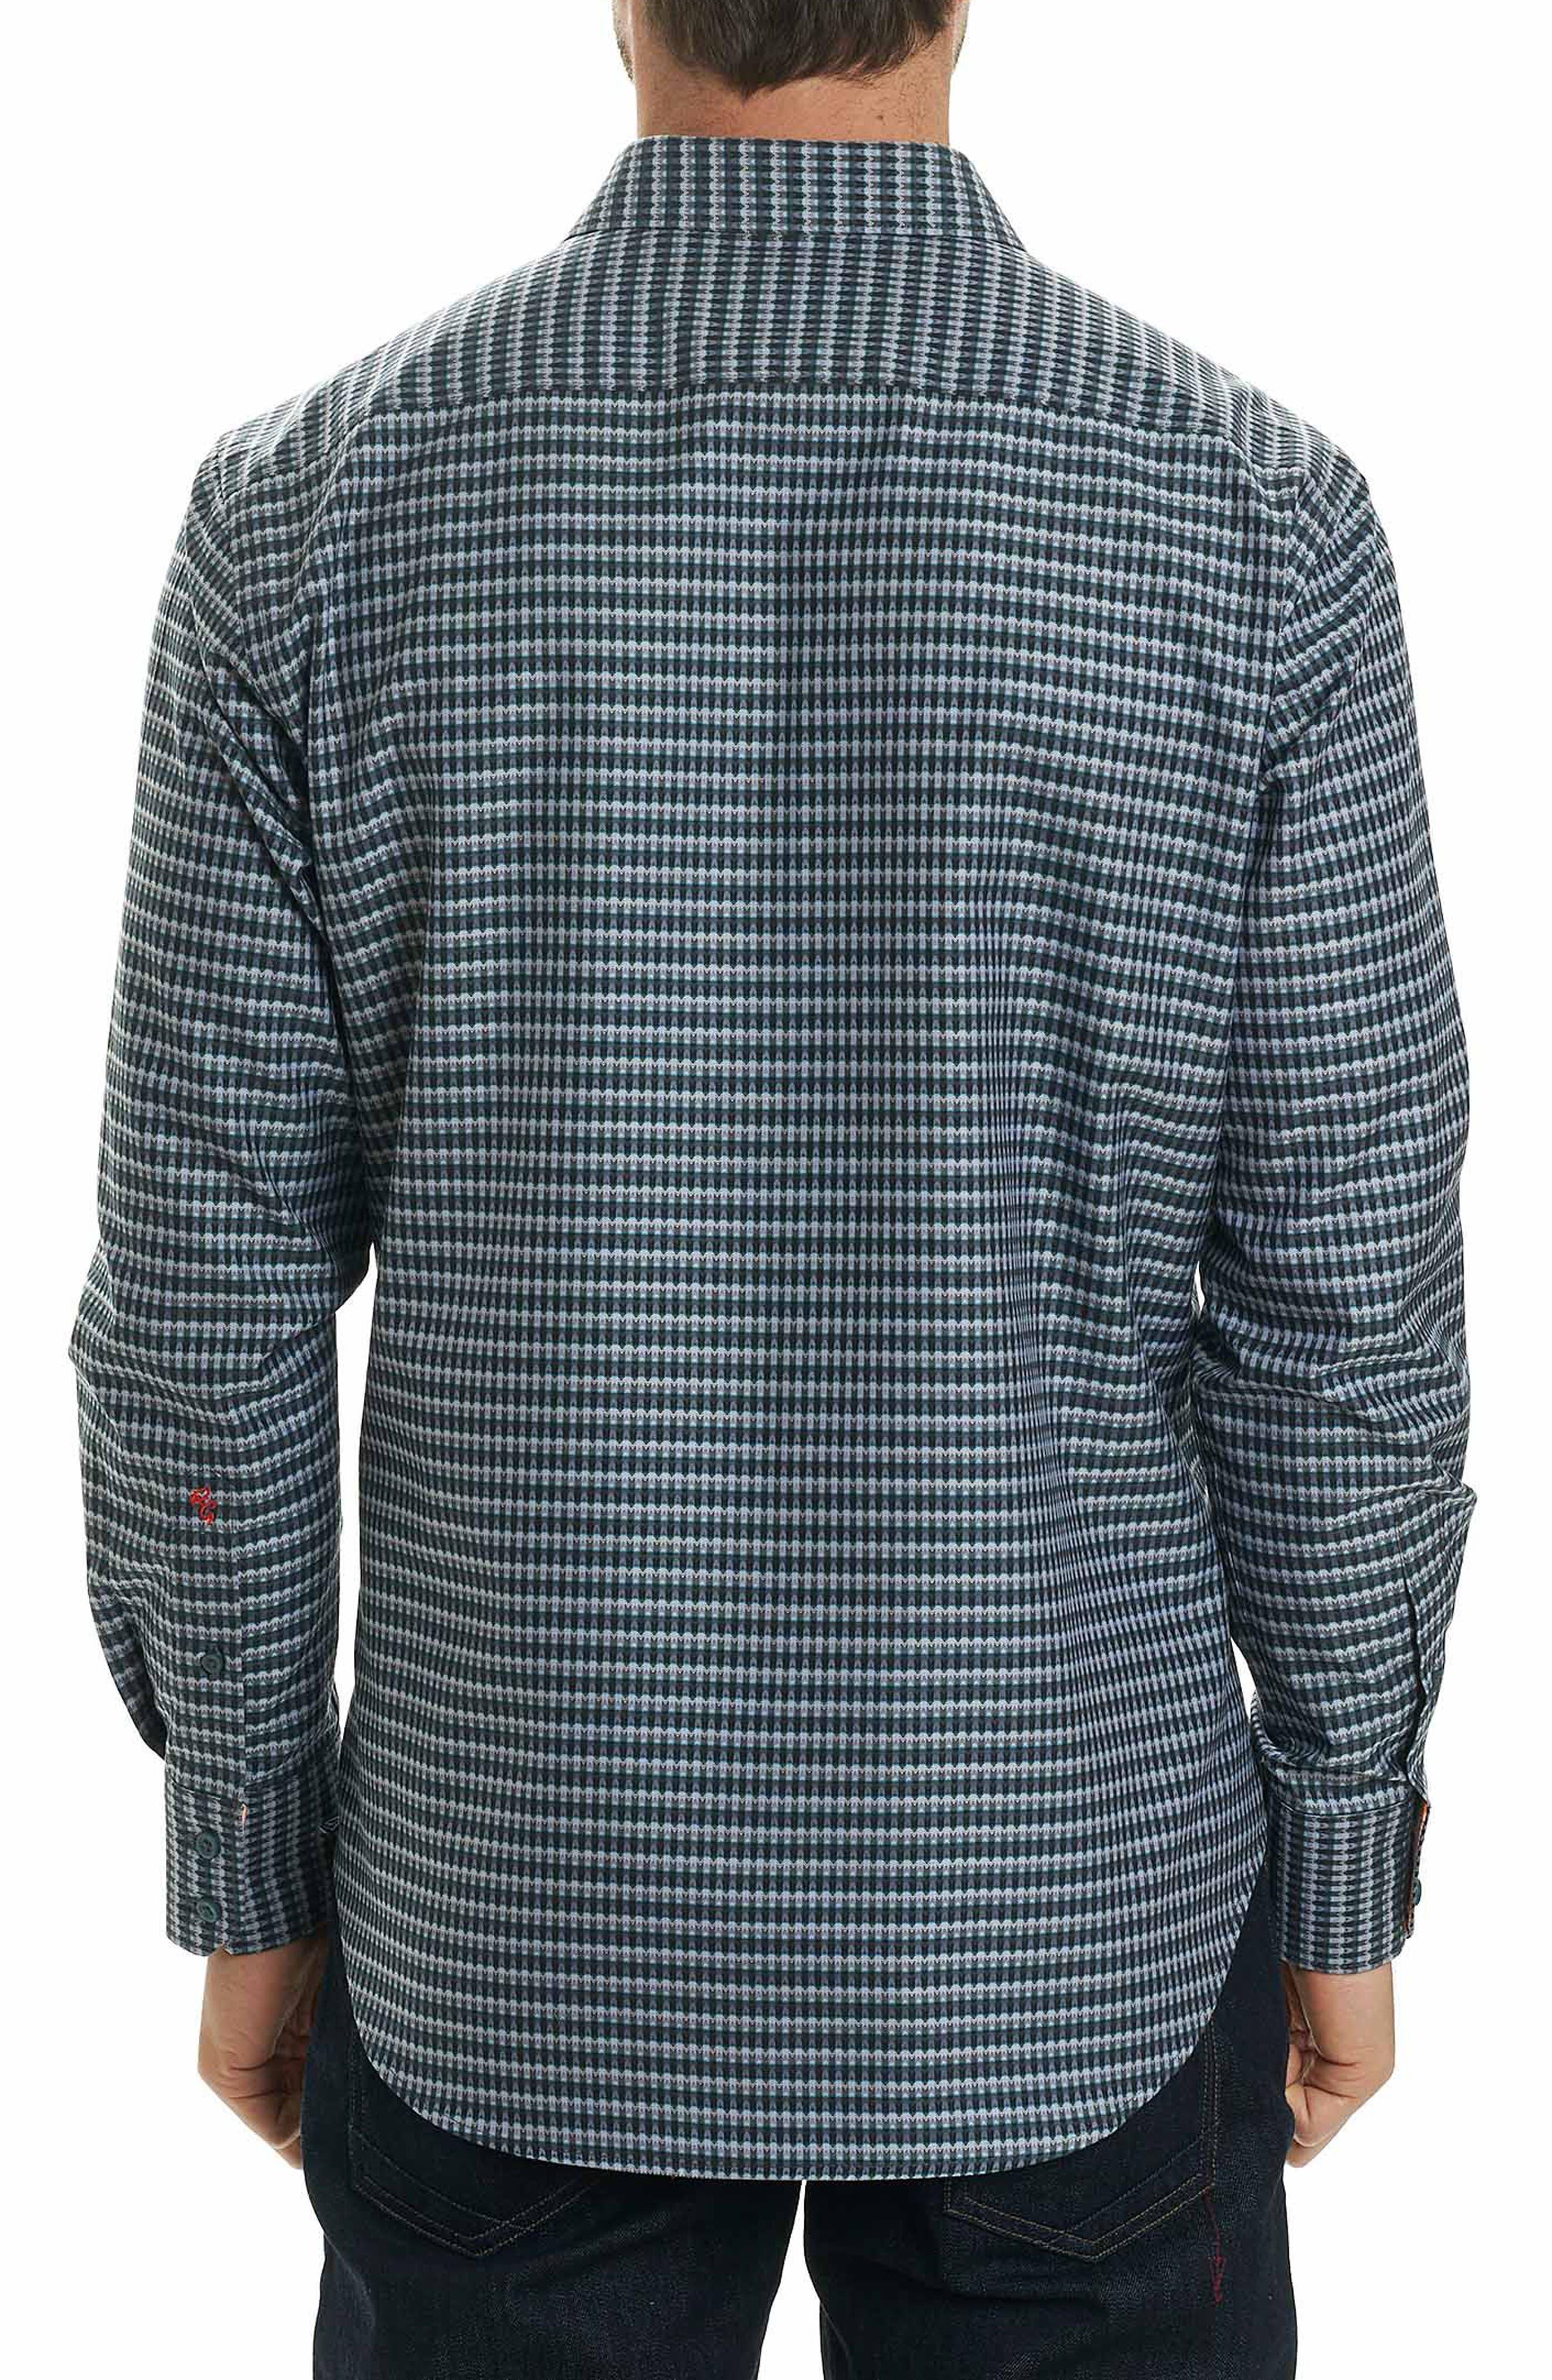 Hill Punch Classic Fit Print Sport Shirt,                             Alternate thumbnail 3, color,